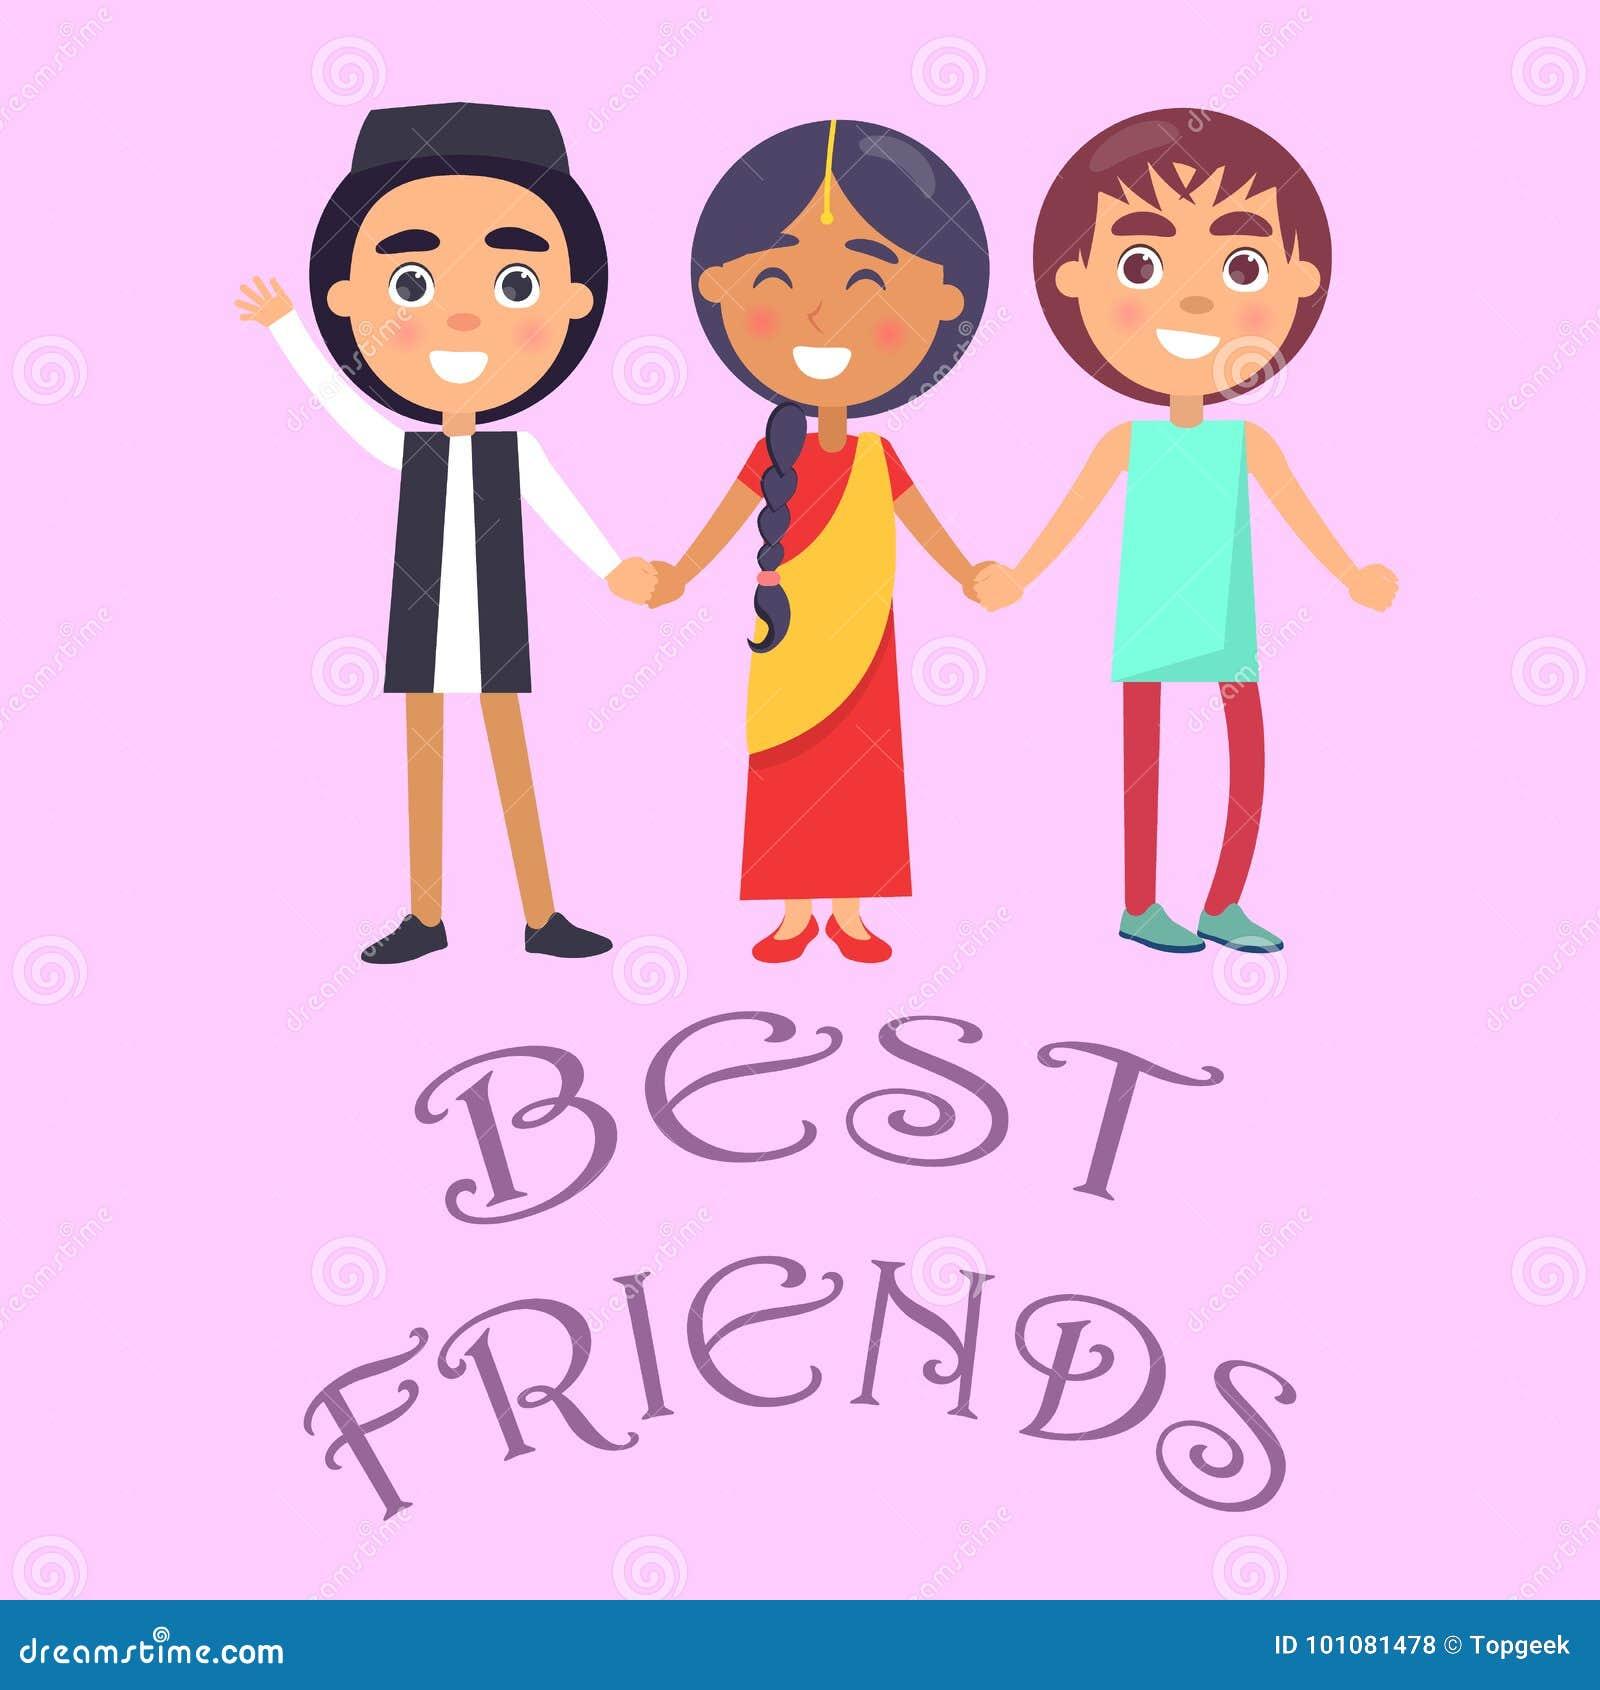 Download Best Friends International Holiday For Children Poster Stock Vector